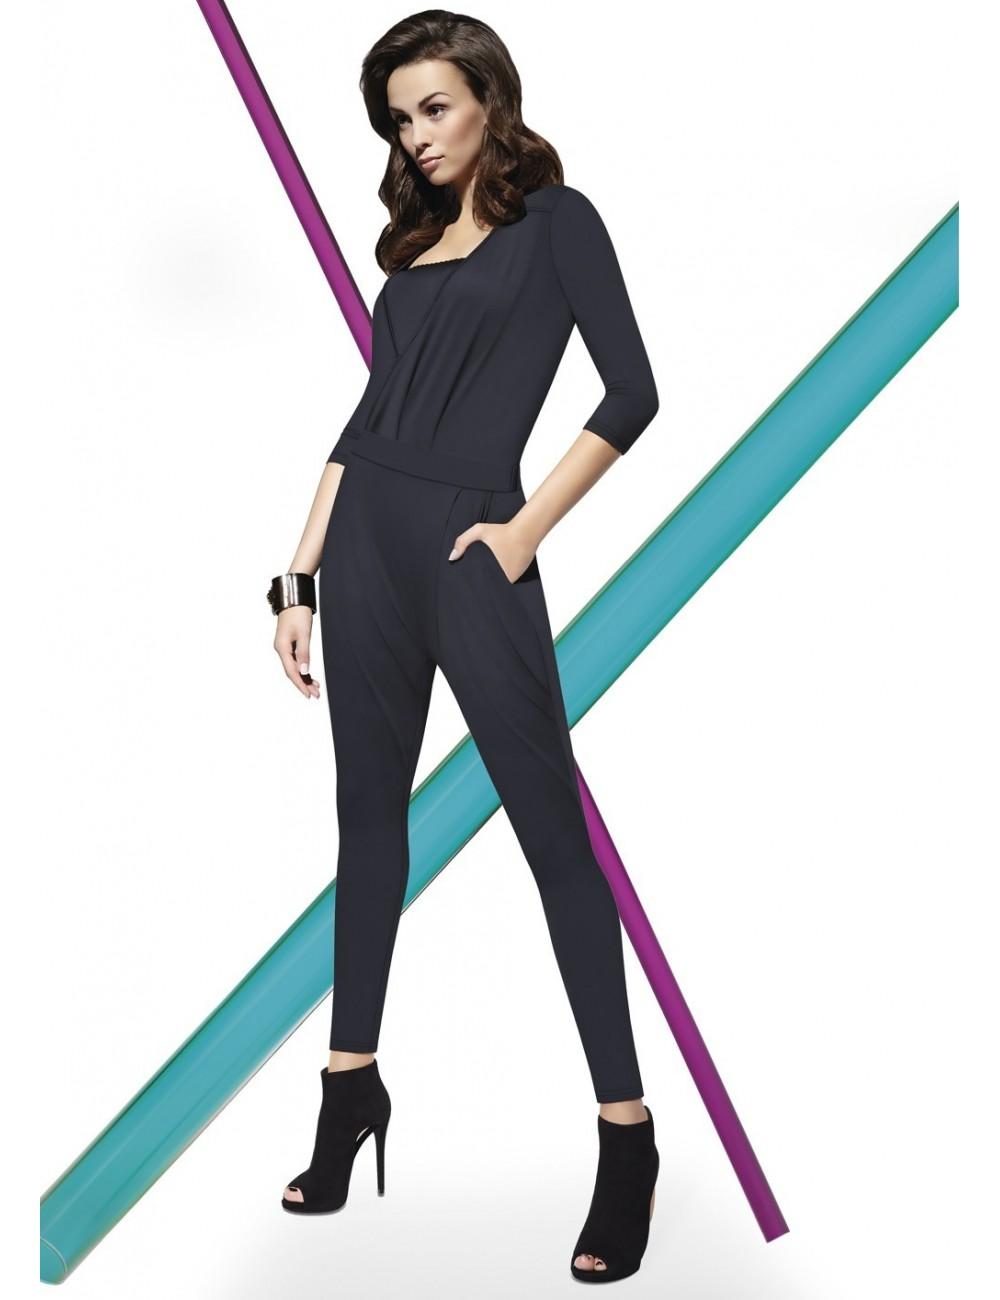 Lingerie - Leggings Sexy - Legging Violetta BB - Bas Bleu